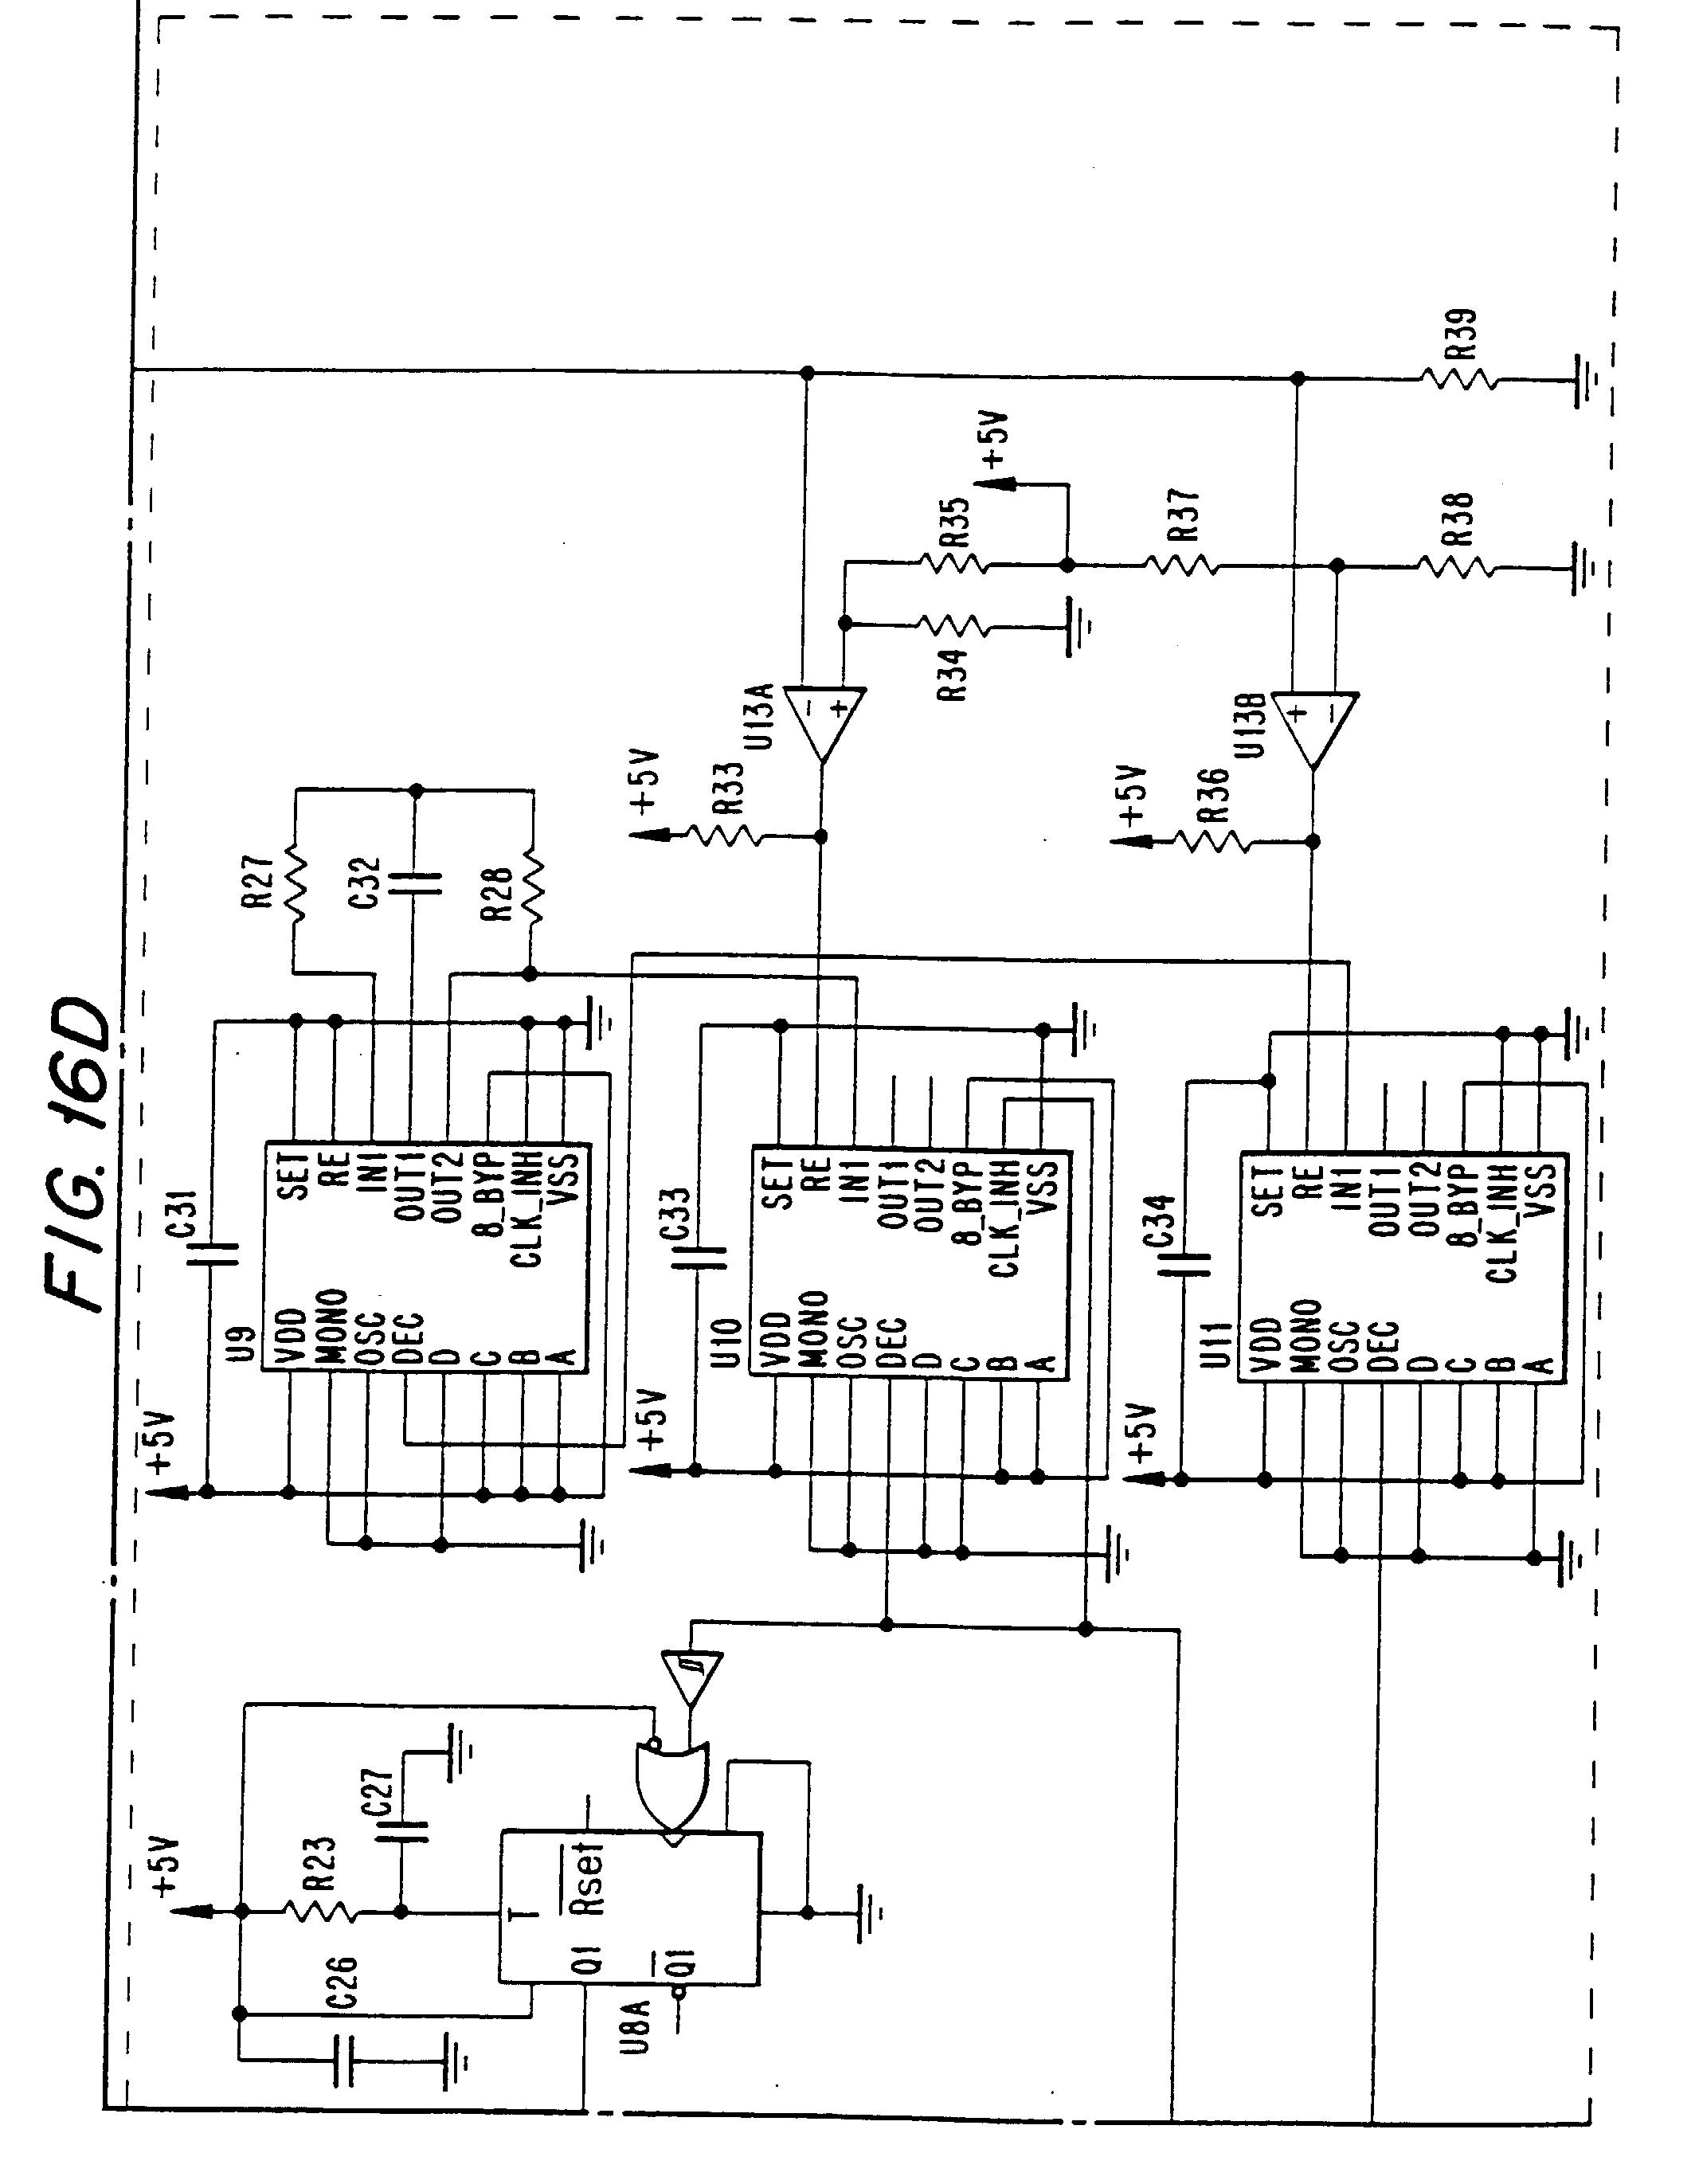 patent ep0789144a2